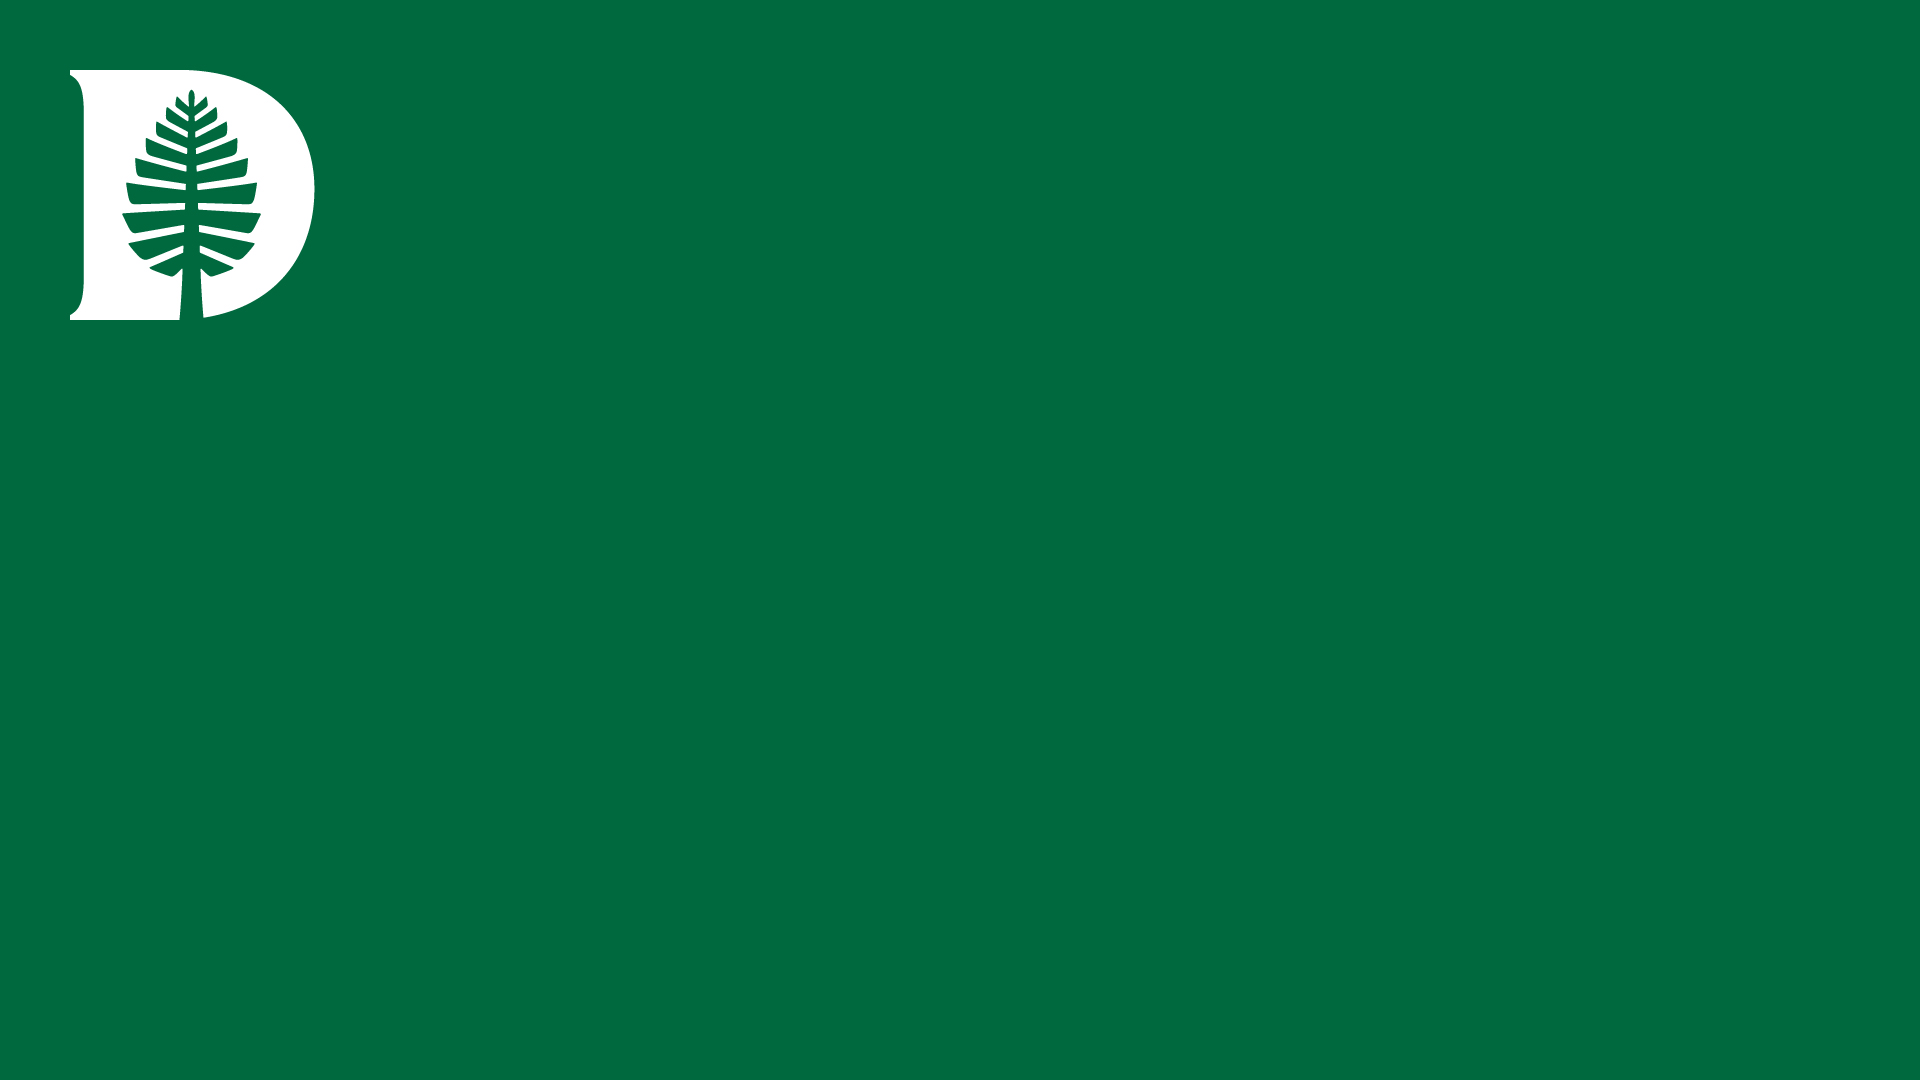 White D-Pine Zoom Background